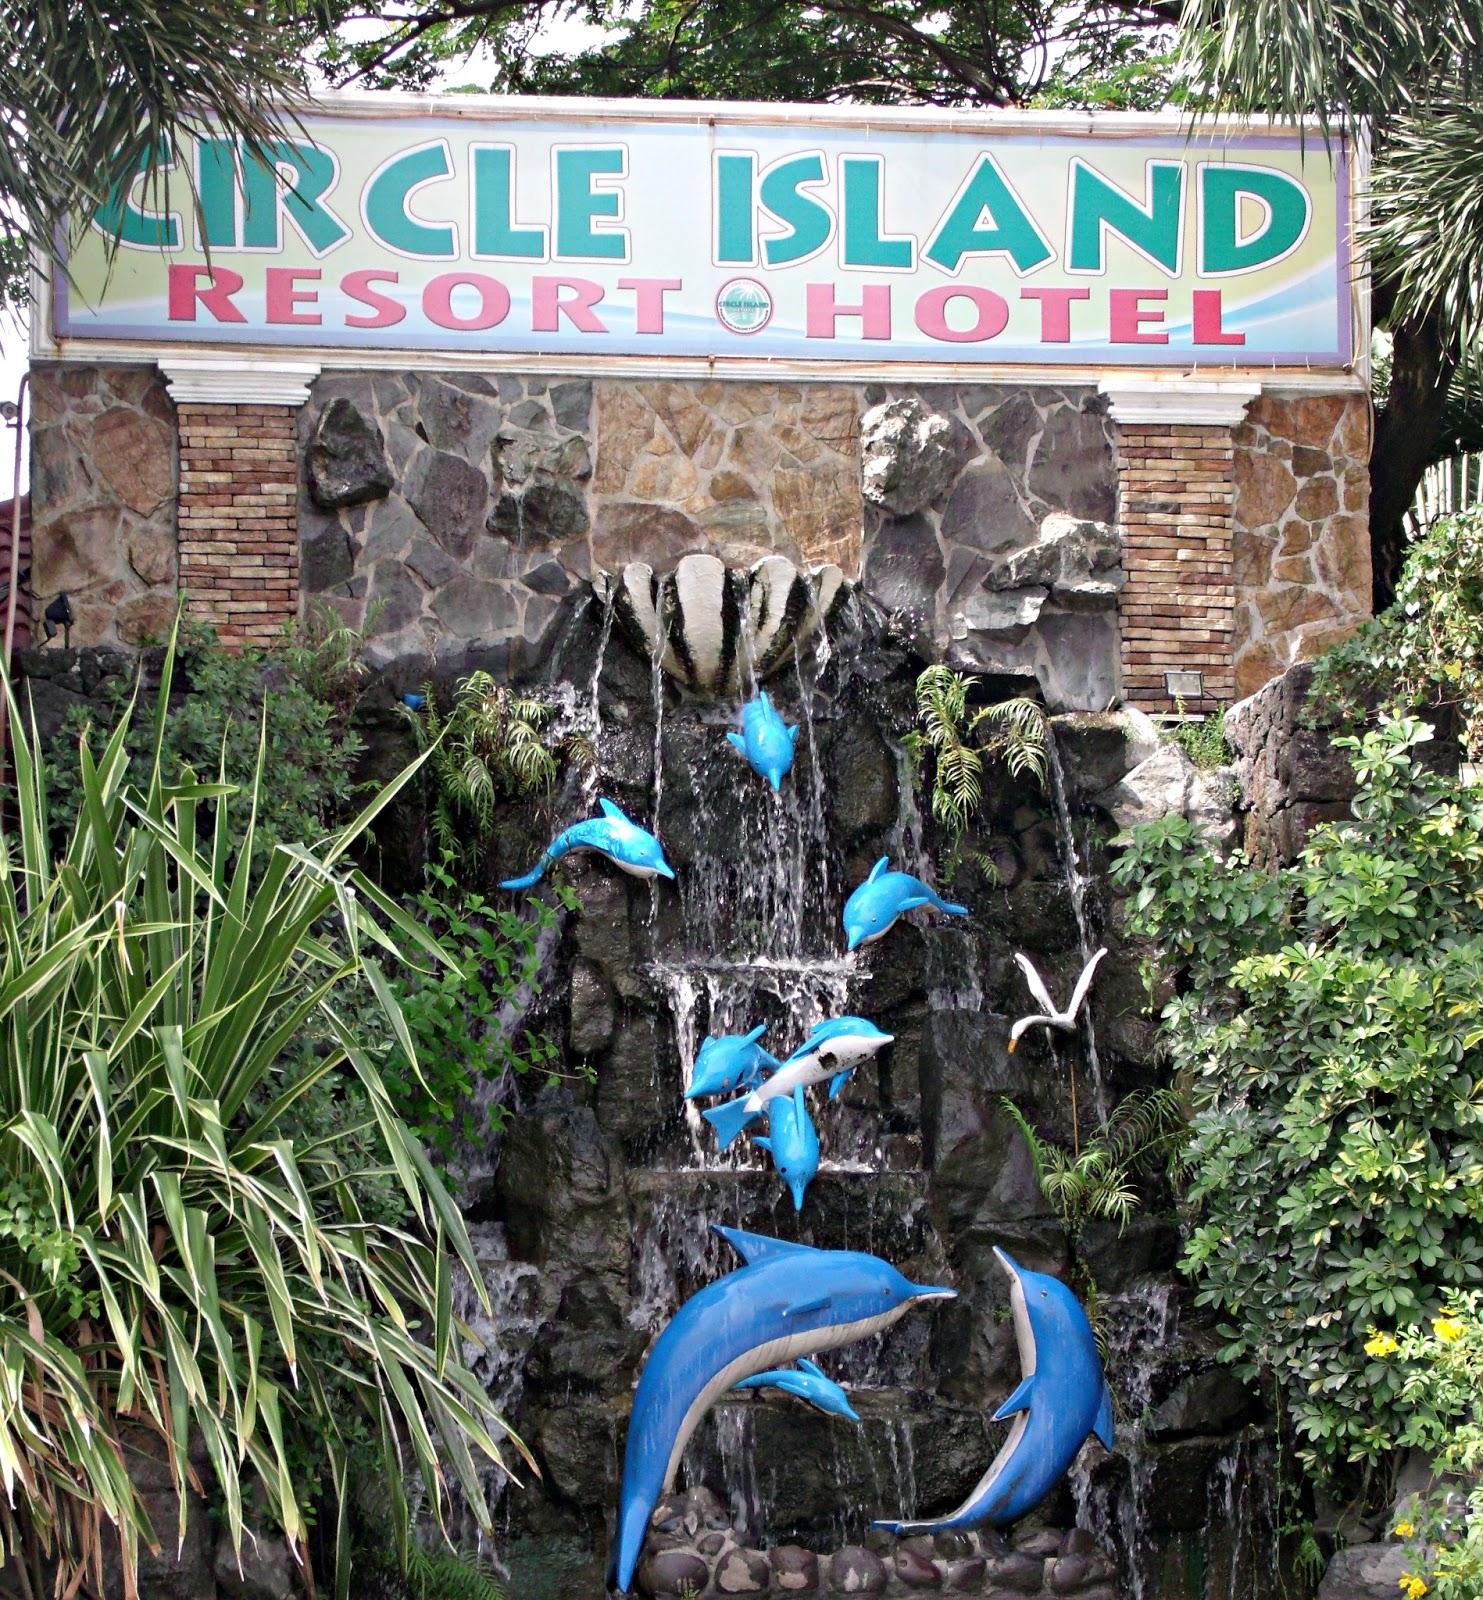 Eat Explore Experience Beat The Summer Heat Getaway Circle Island Resort